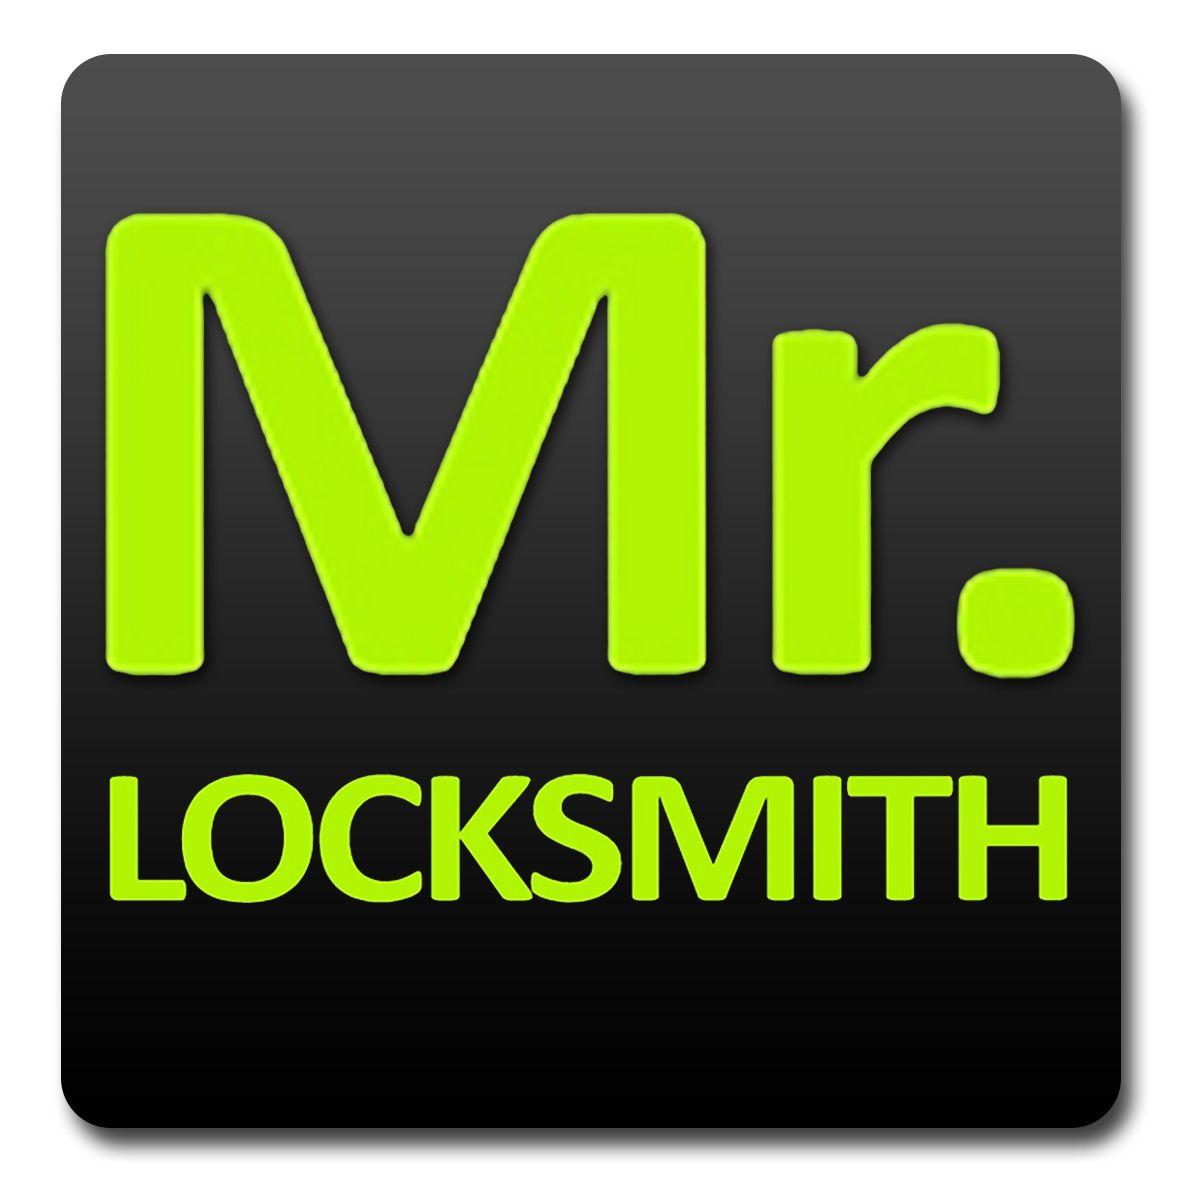 Mr LOCKSMITH | Best Locksmith Washington DC call 202-630-4979